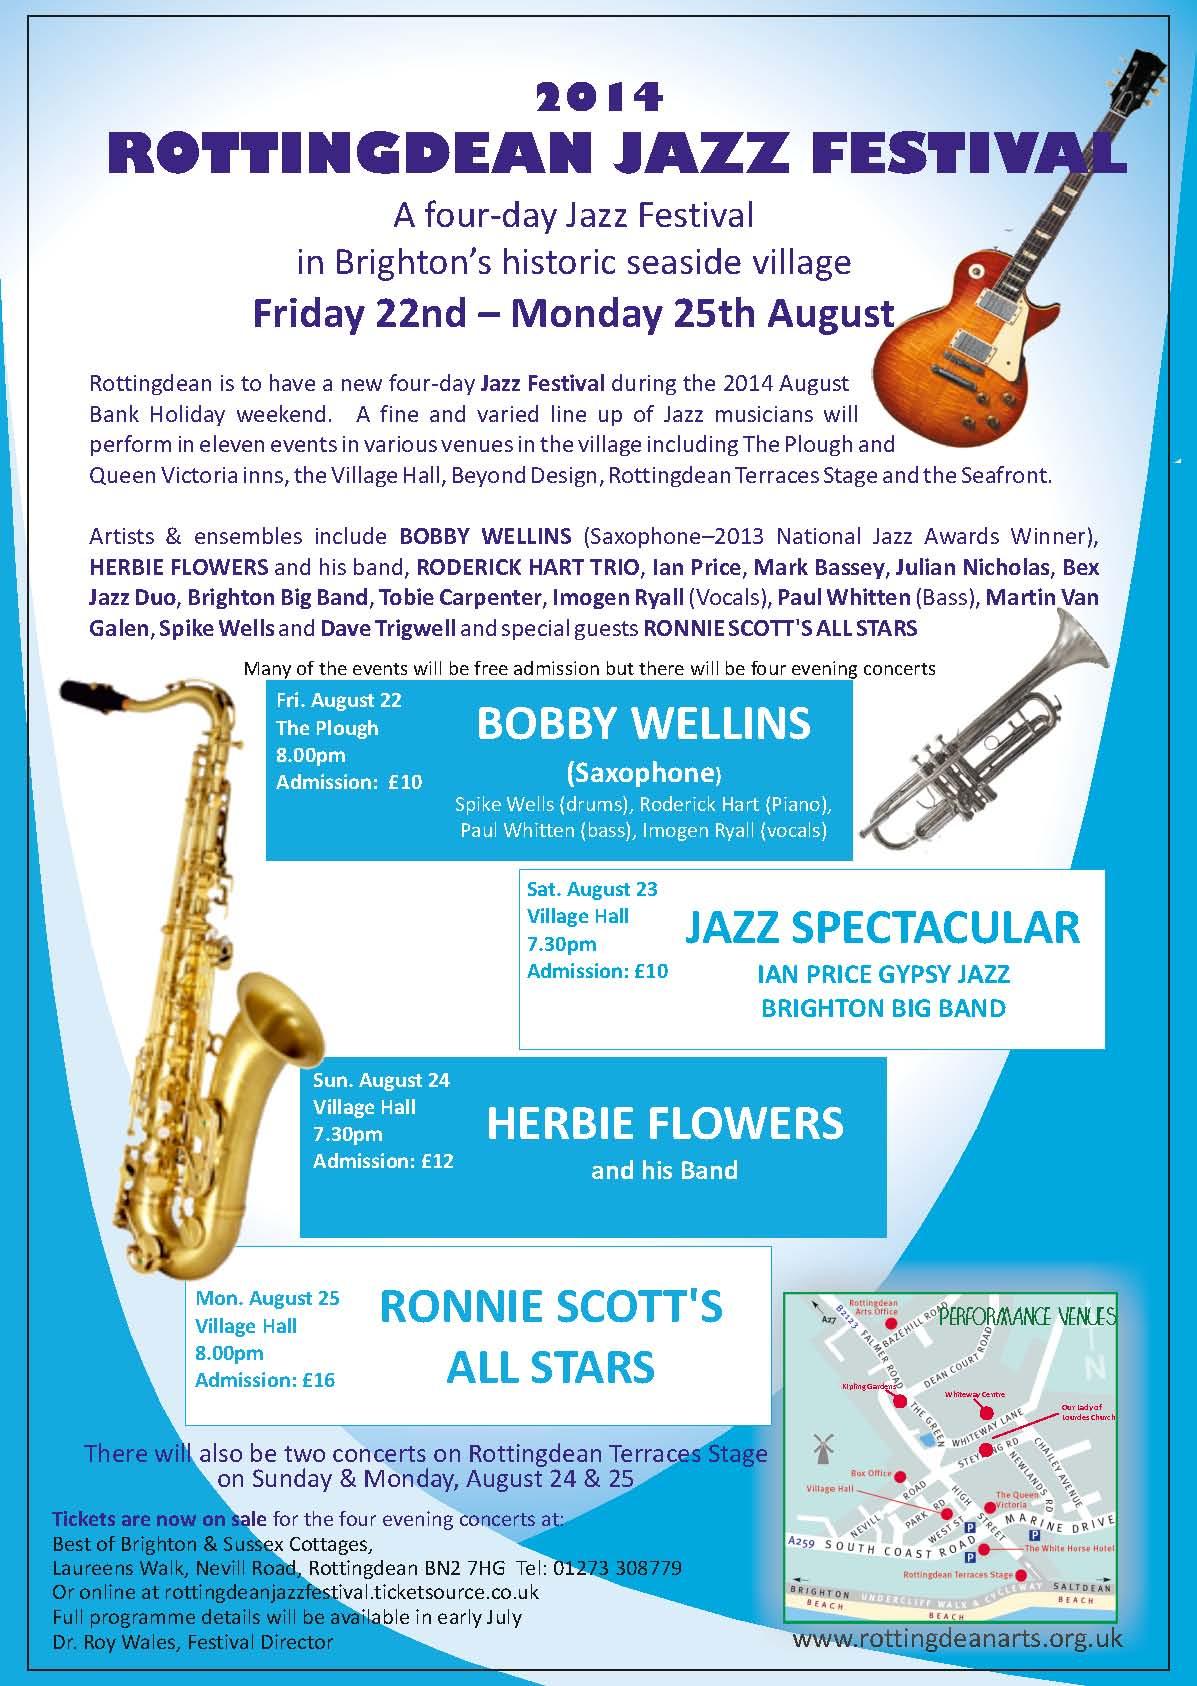 Rottingdean-Arts-Festival-2014_Page_2